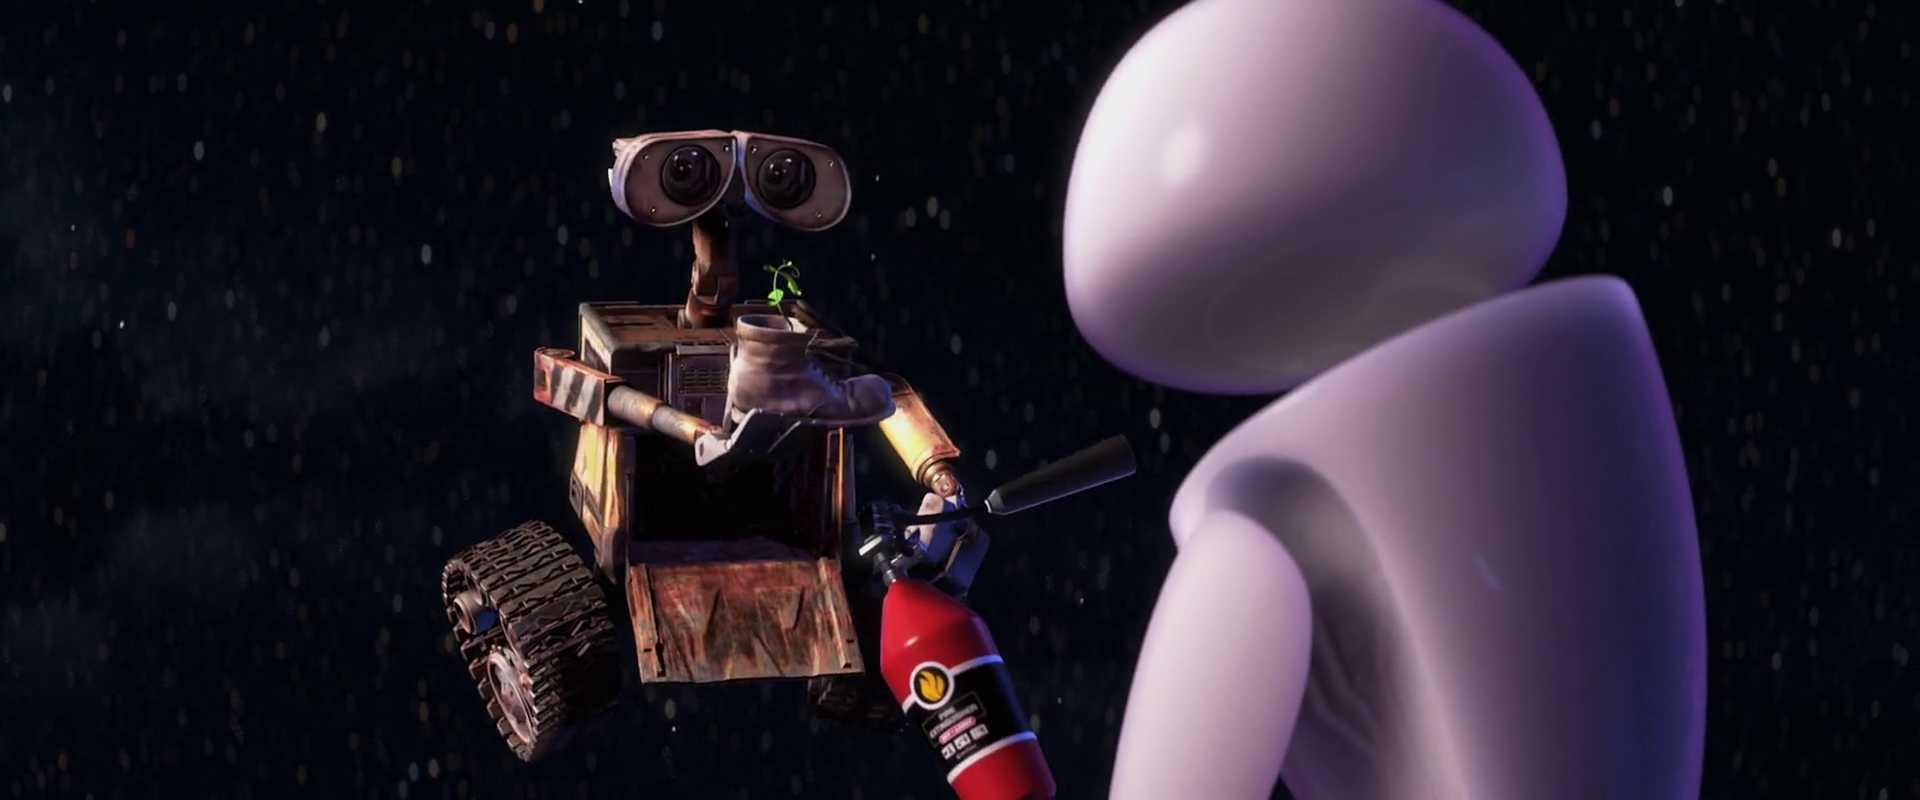 WALL-E snapshot 4